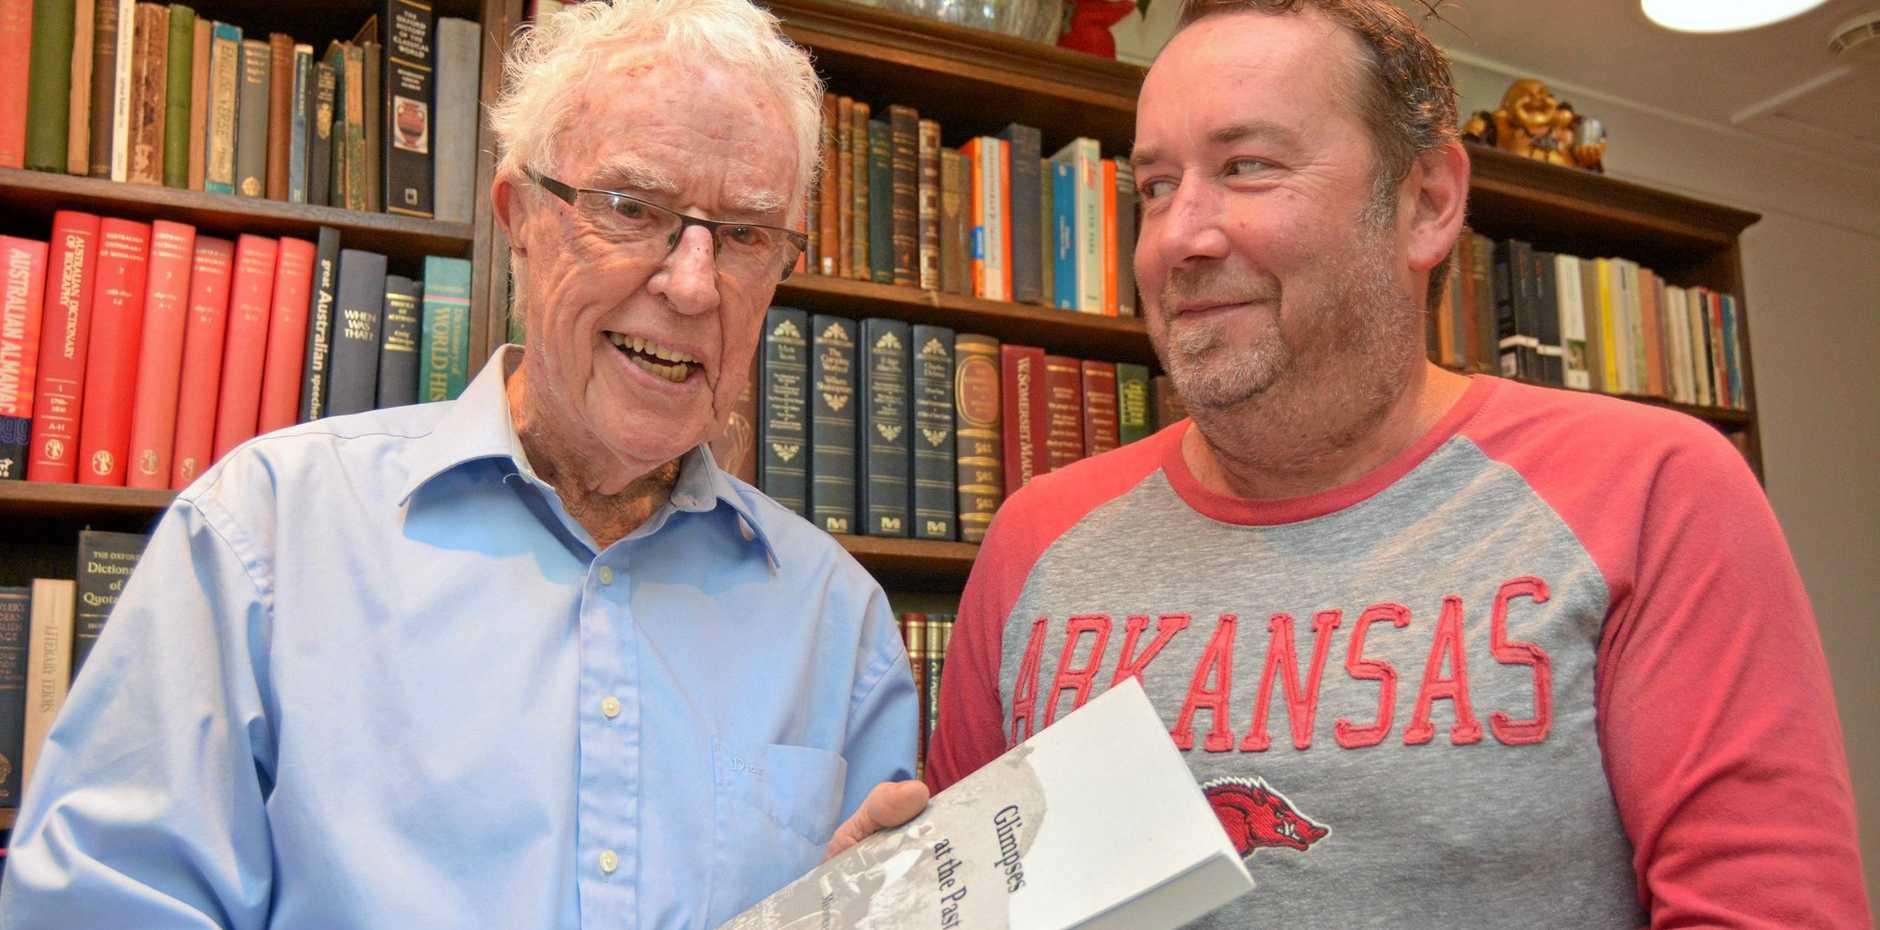 David Rae and Christian Ellis lavish time and effort on an encyclopedia of the Tweed Coasts social history.